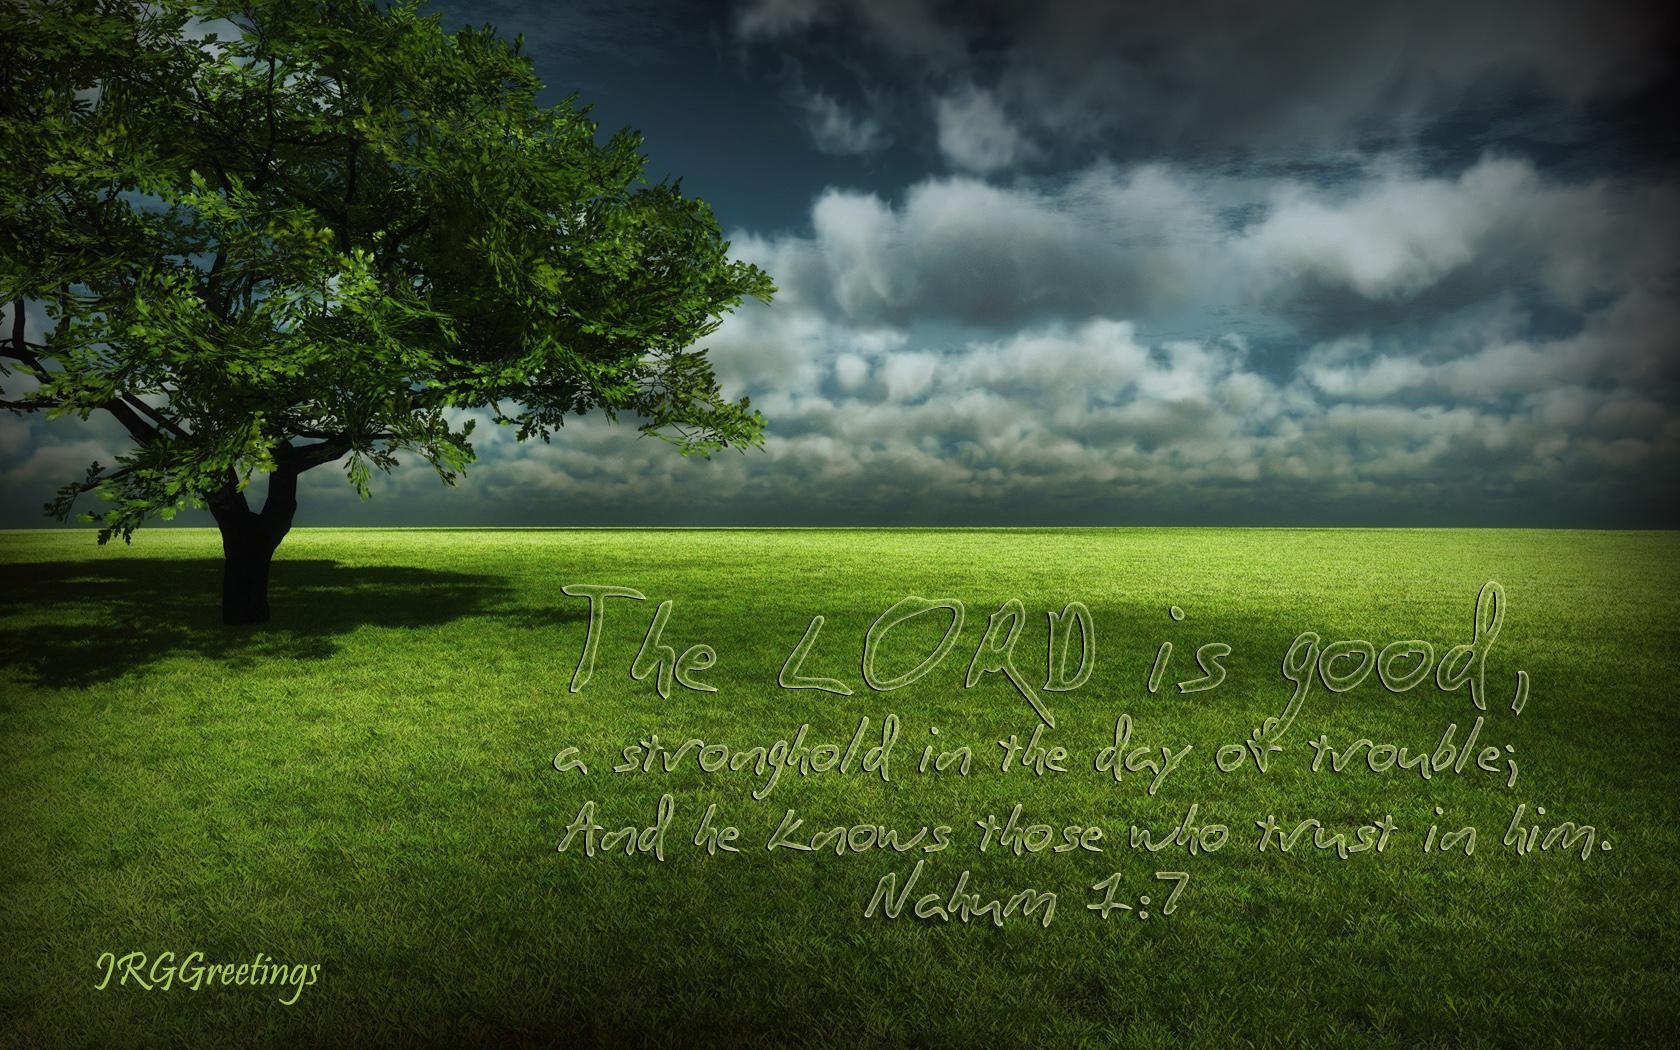 Download HQ Christian Wallpaper Wallpaper Num 14 1680 x 1050 1 1680x1050